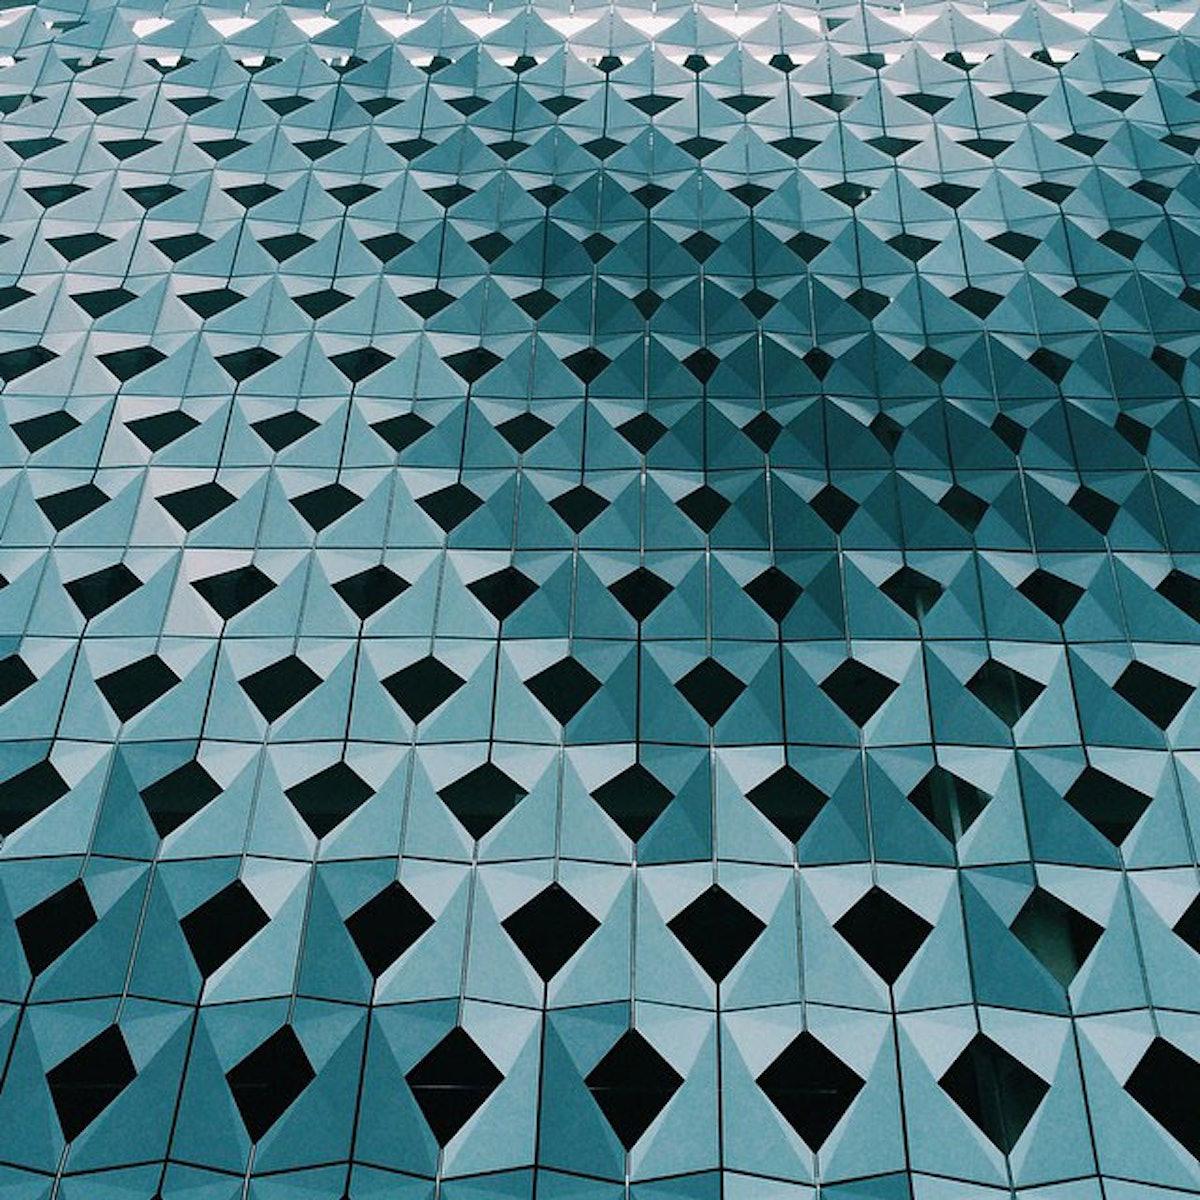 Rafael de Cardenas captures Miami architecture